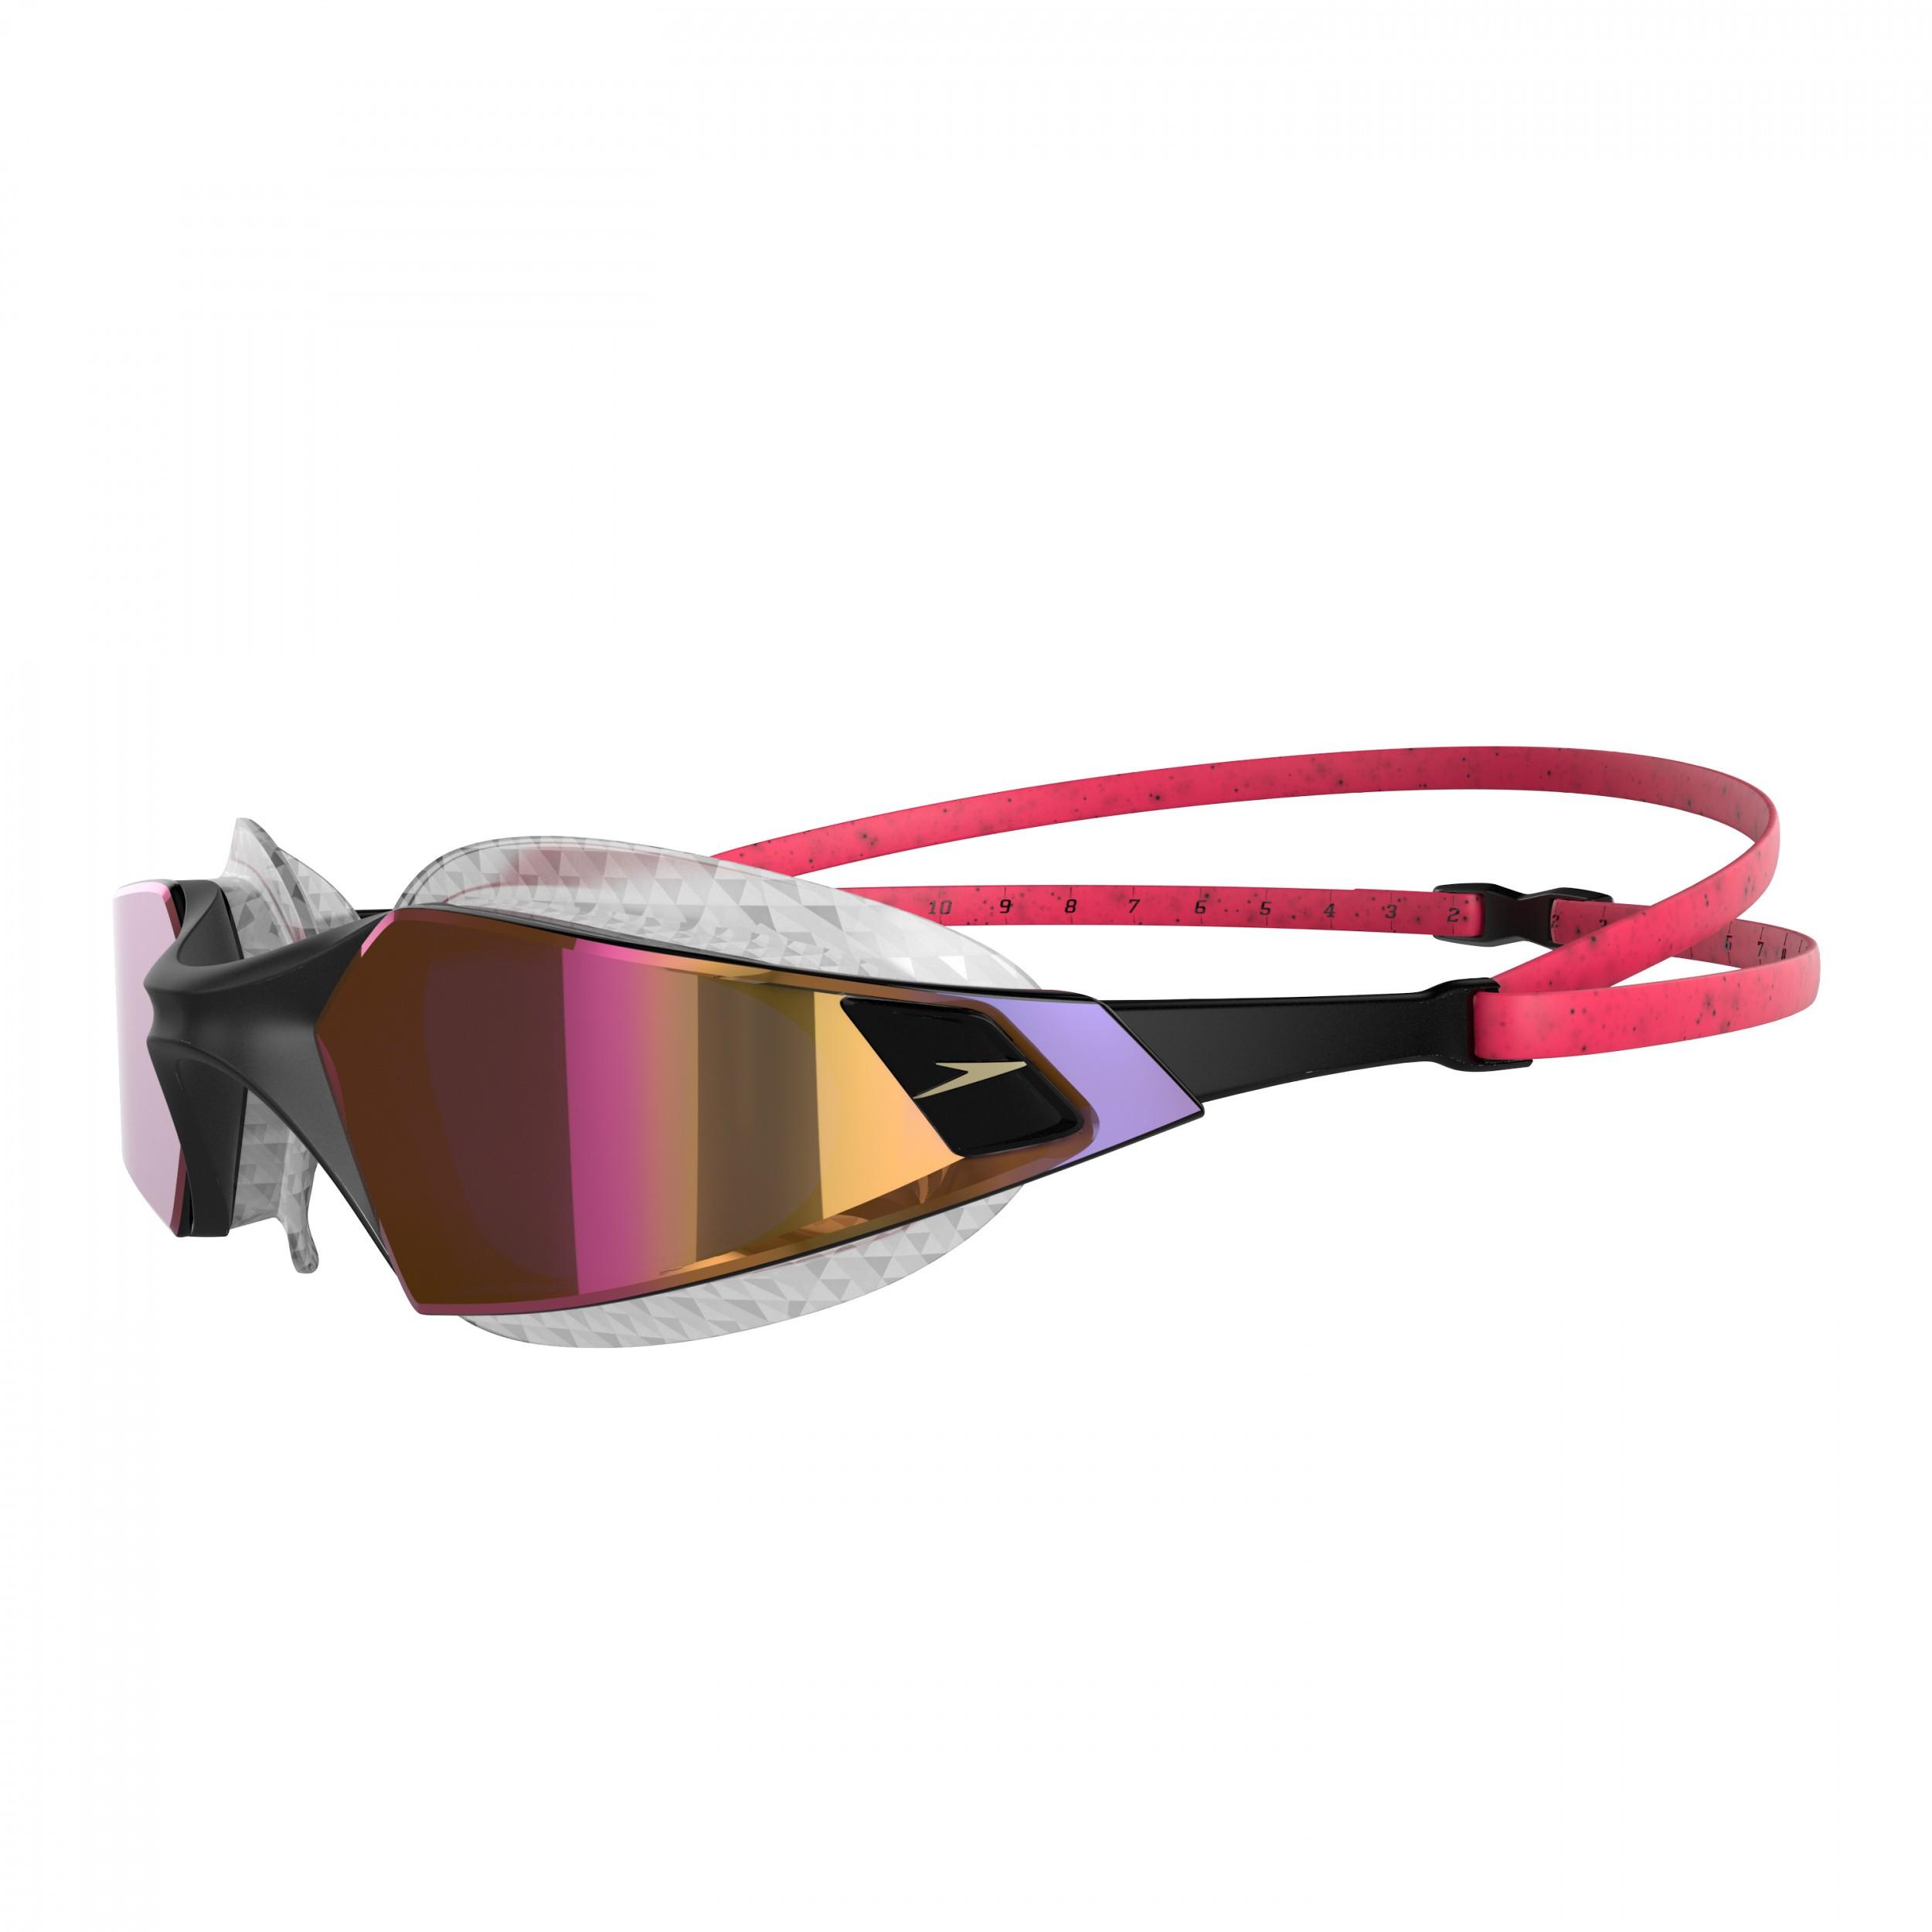 Speedo Zwembril Aquapulse Pro mirror red/gold